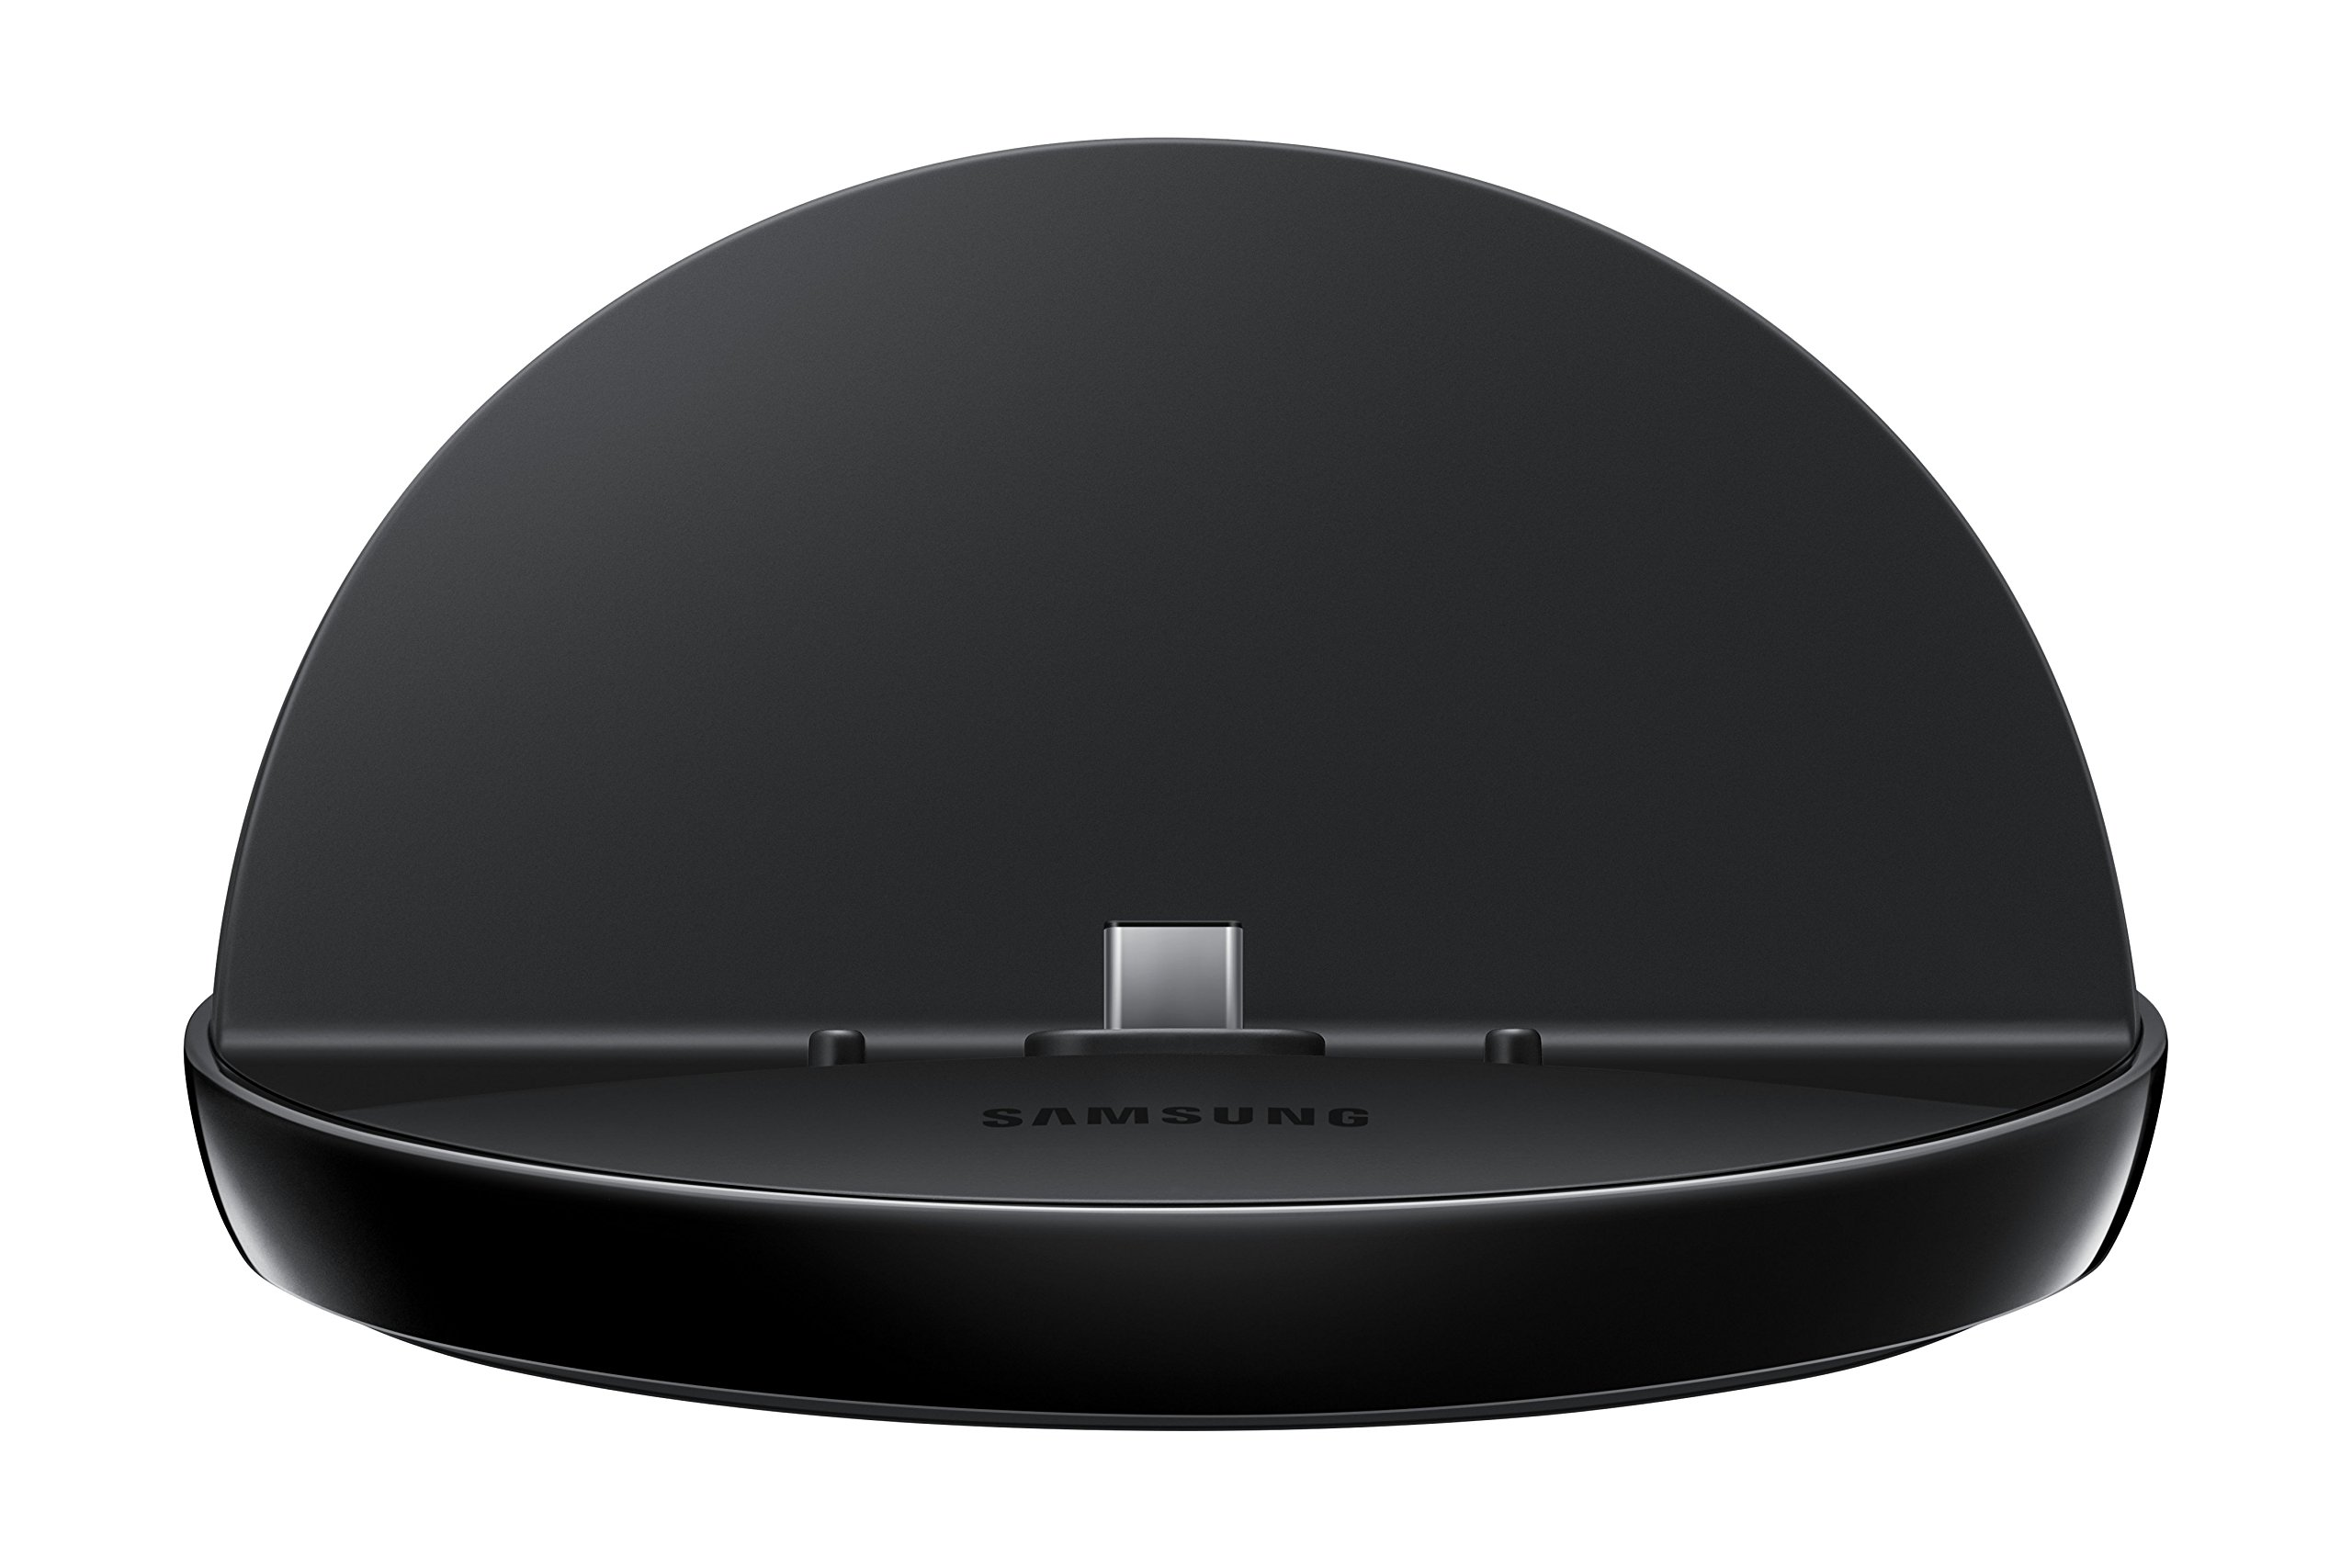 Samsung Galaxy Tab A 8.0'' (New) USB Type-C Charging Dock, Black, EE-D3000BBEGUJ